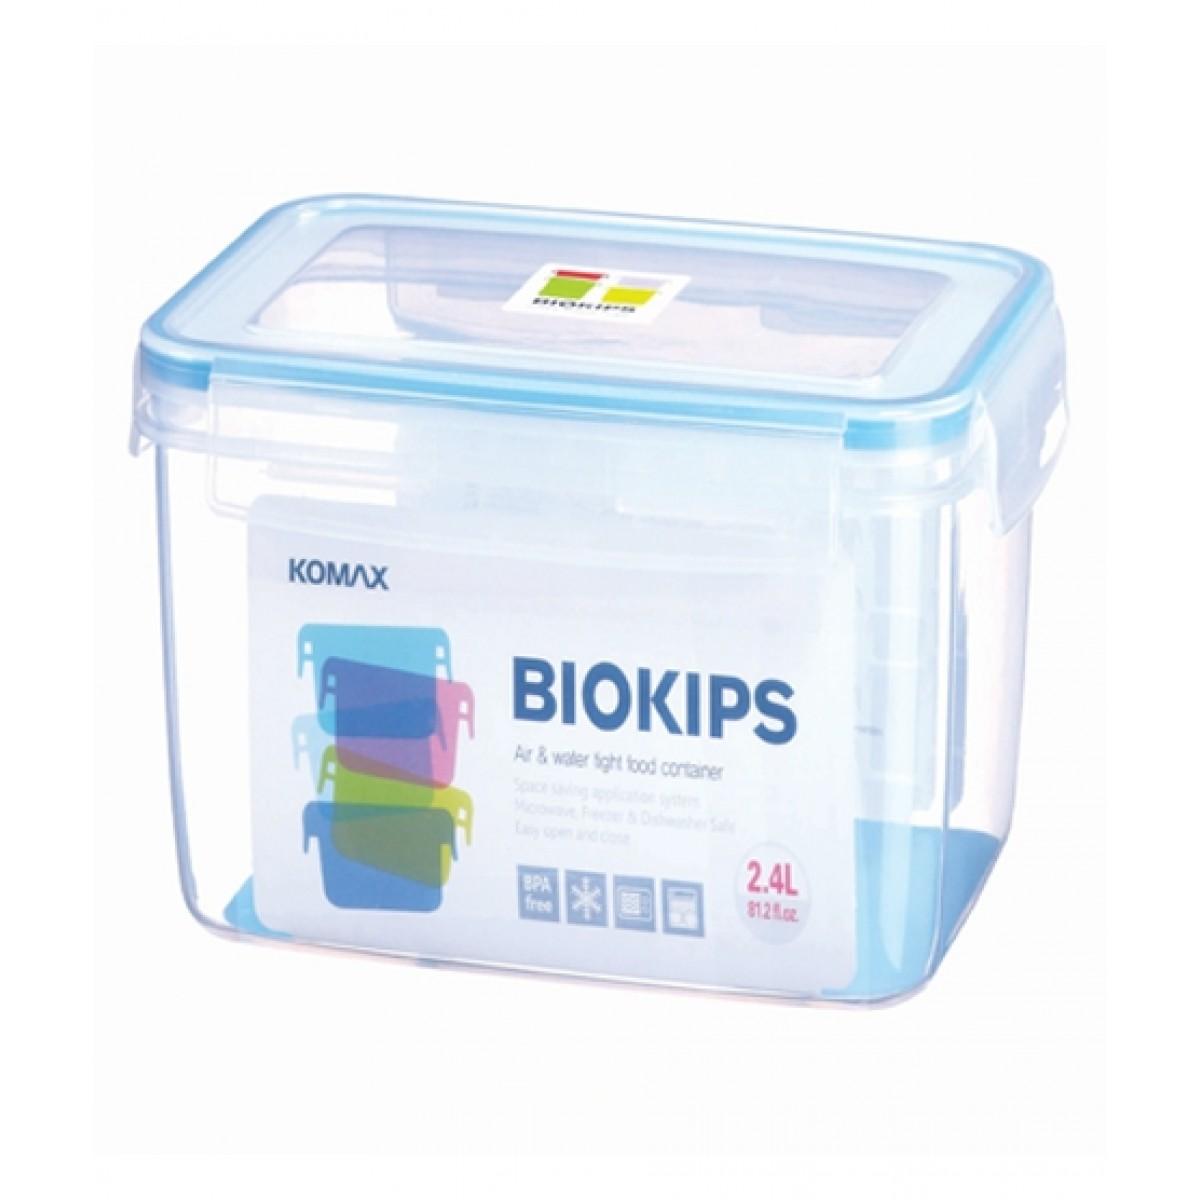 Komax Biokips R41 Air & Watertight Food Container 2.4Ltr (71505)